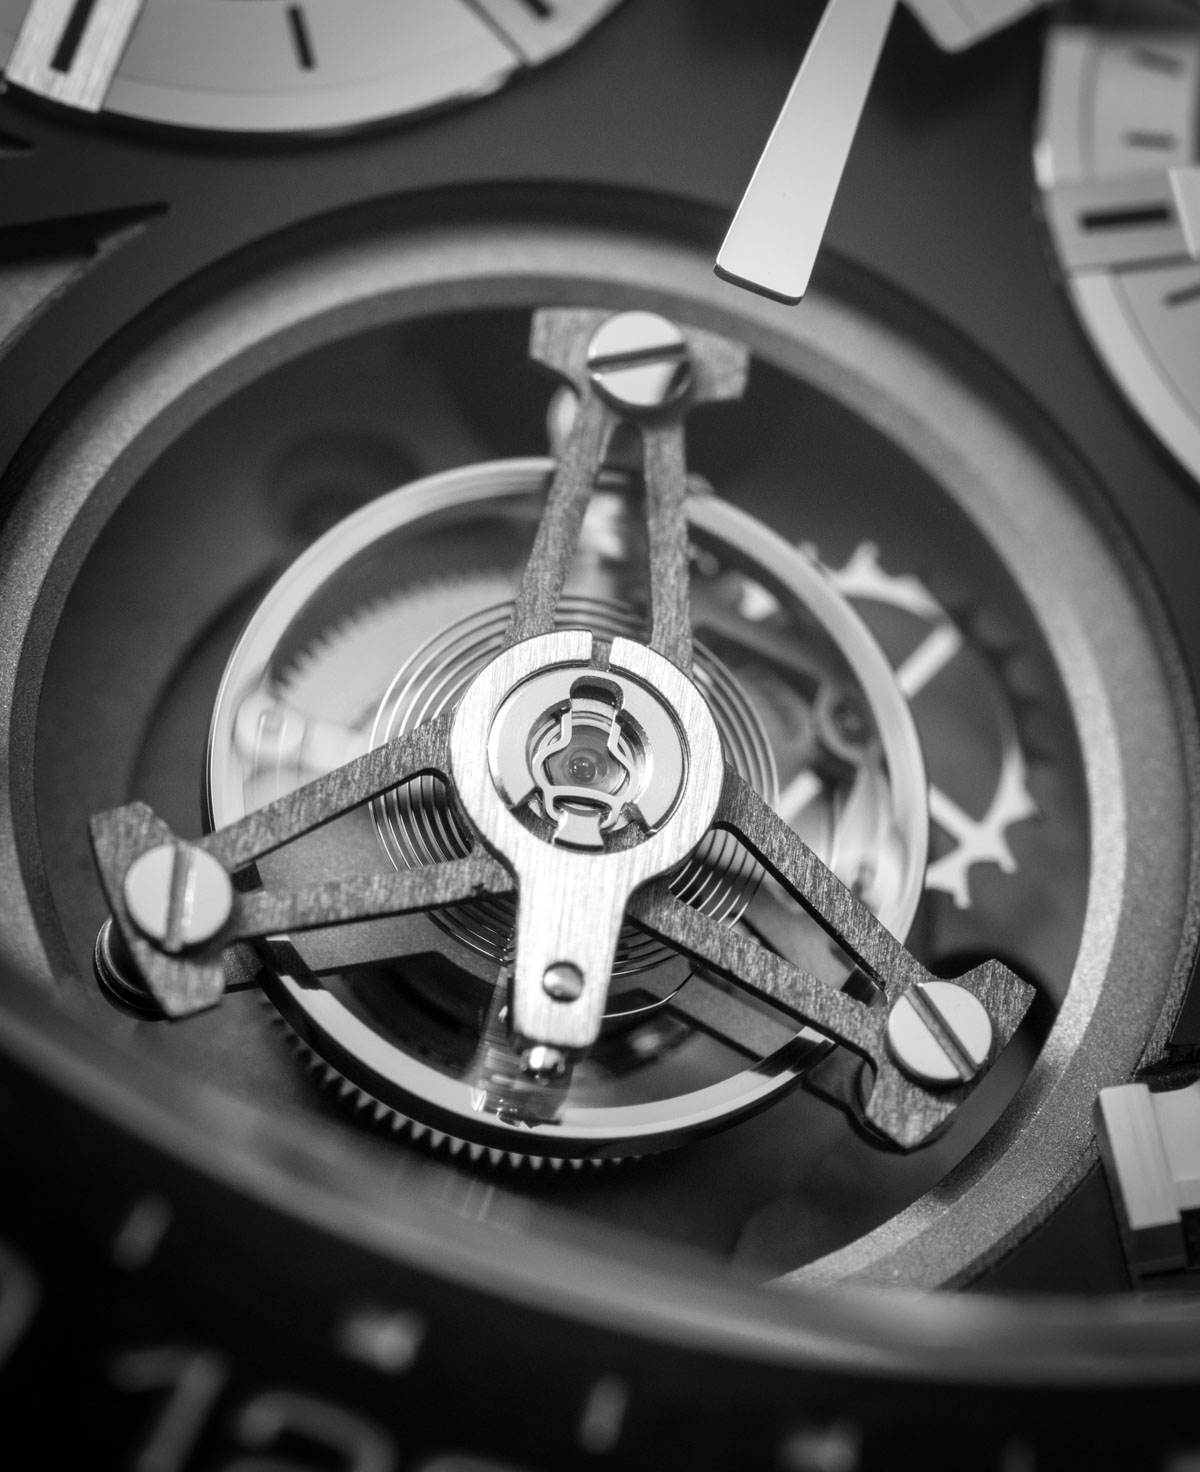 tag-heuer-heuer02t-tourbillon-carrera-orasblog-karora-luxus-ora-kronograf-14.jpg